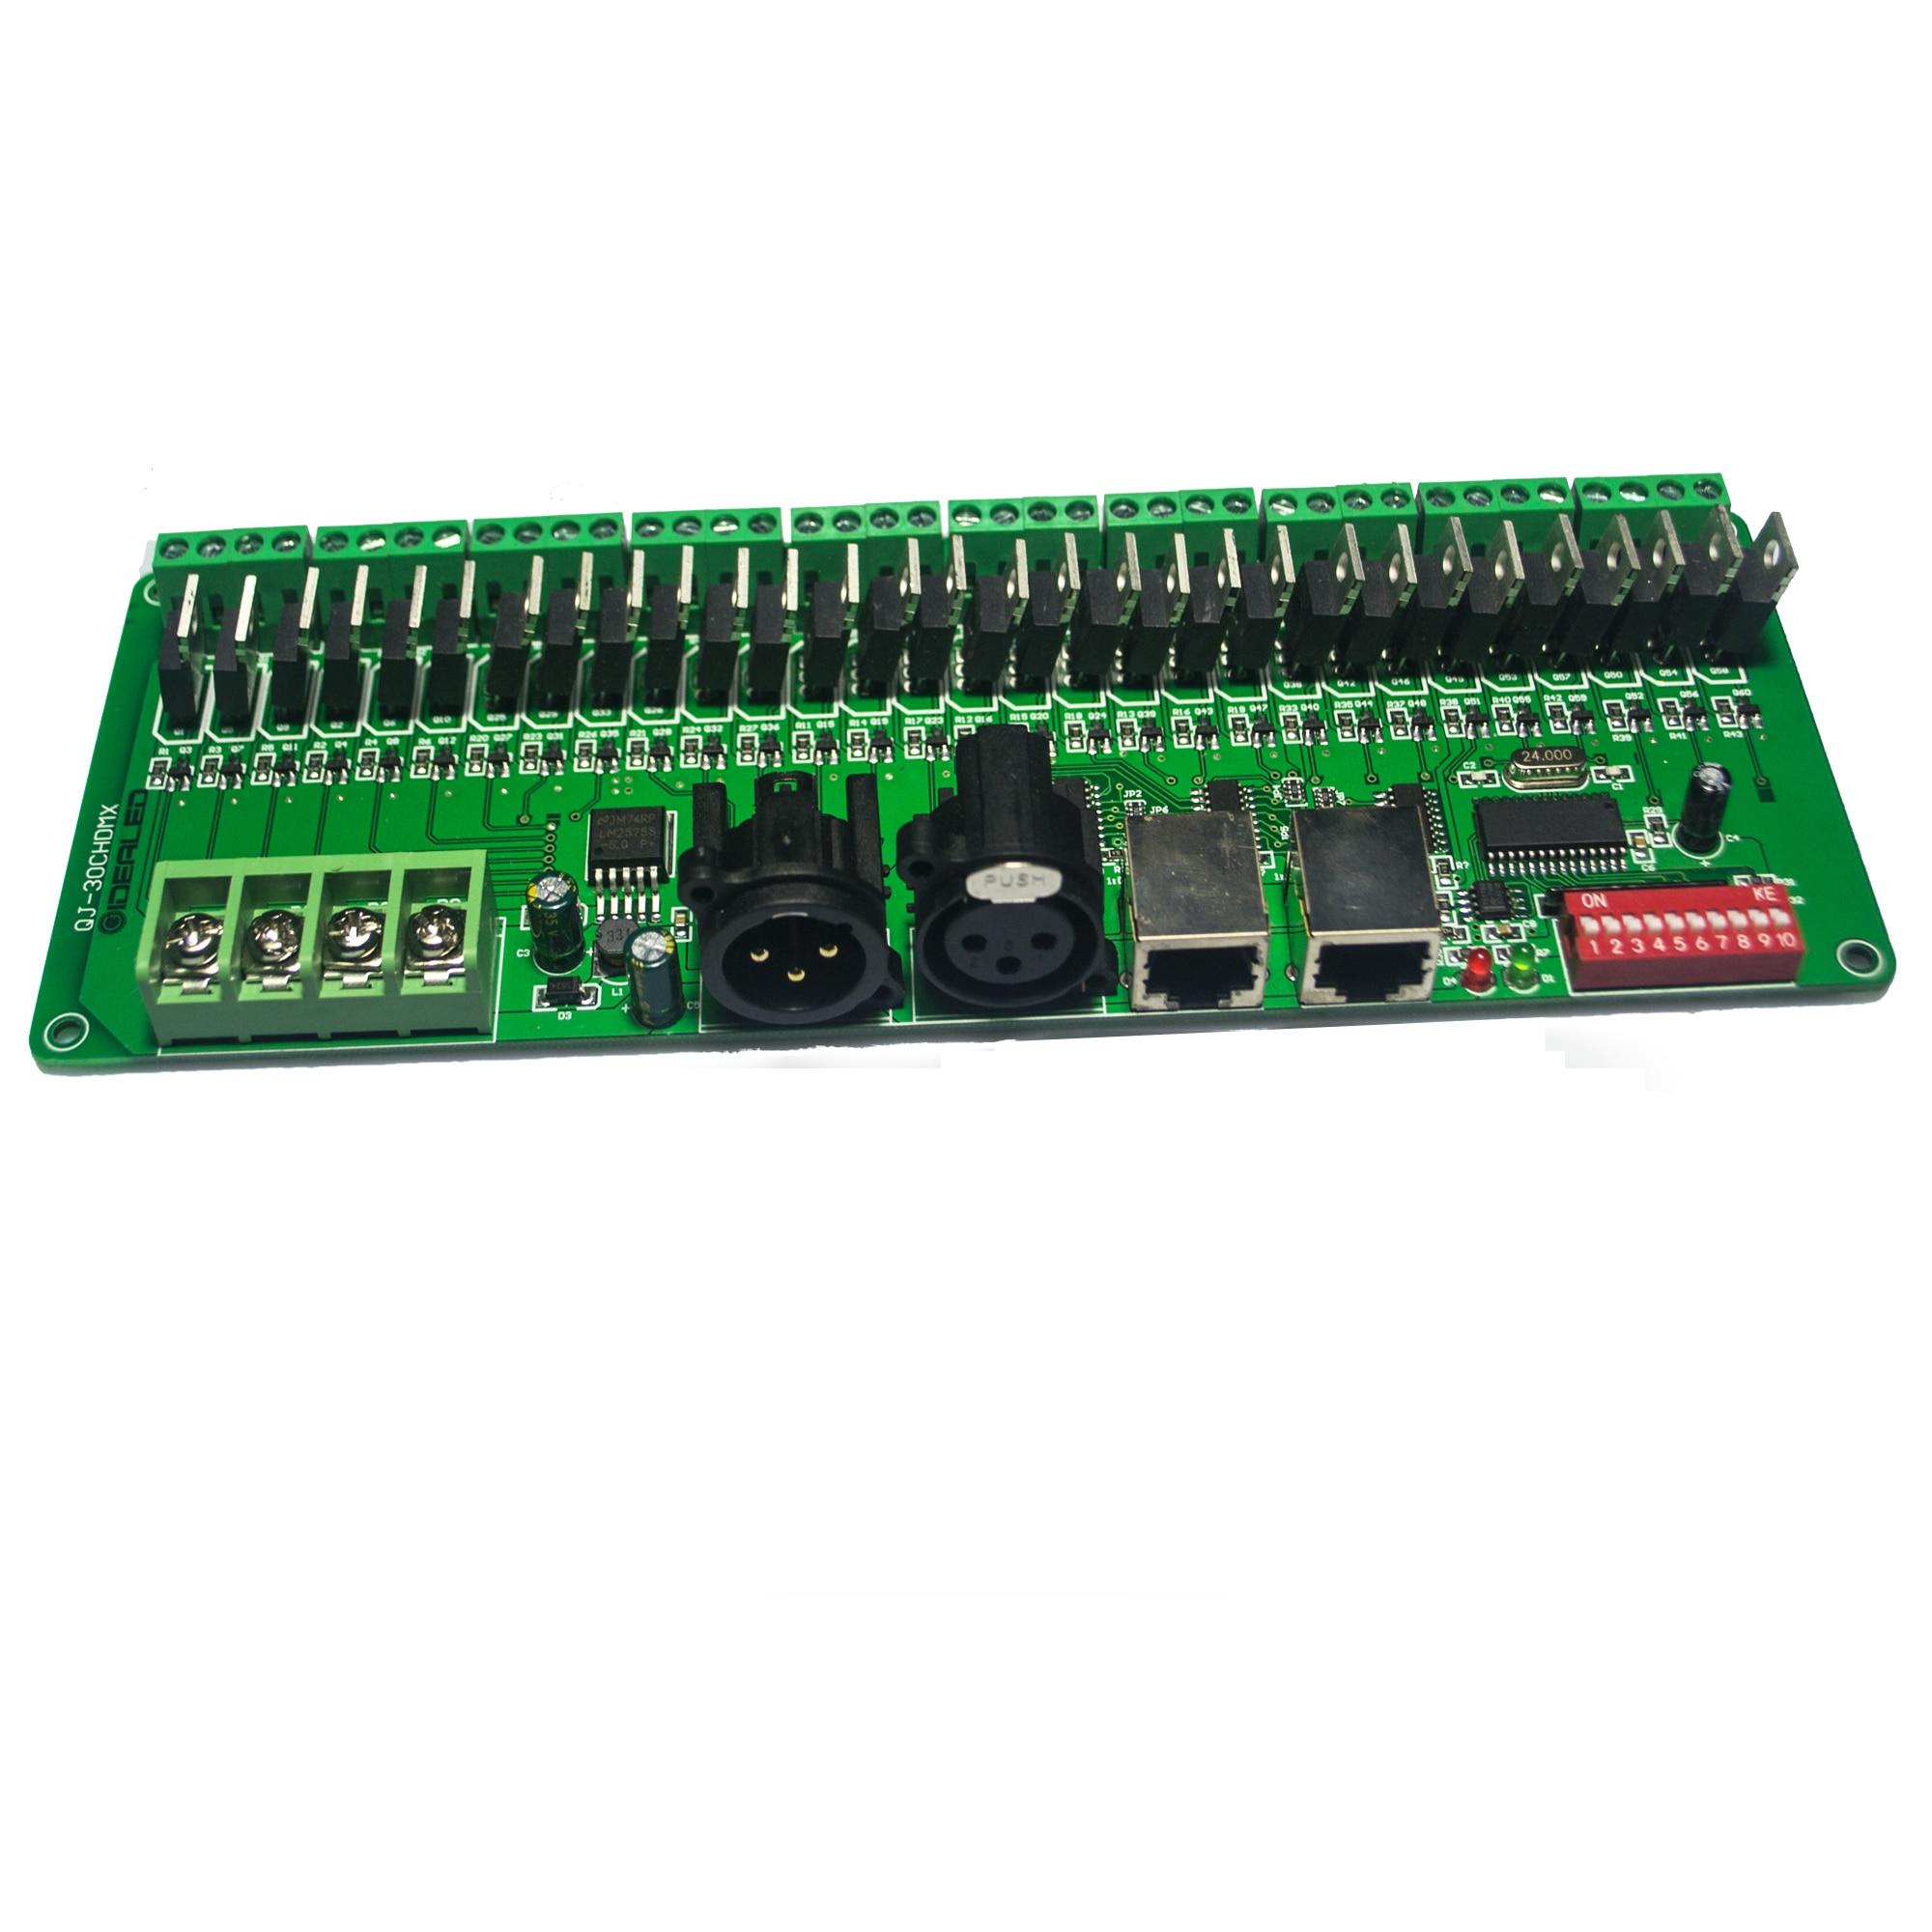 30 channel DMX Decoder with RJ45 and XLR Plug 27 channel DMX512 Decoder For DC12V-24V RGB Strip Controller 60A dmx dimmer driver